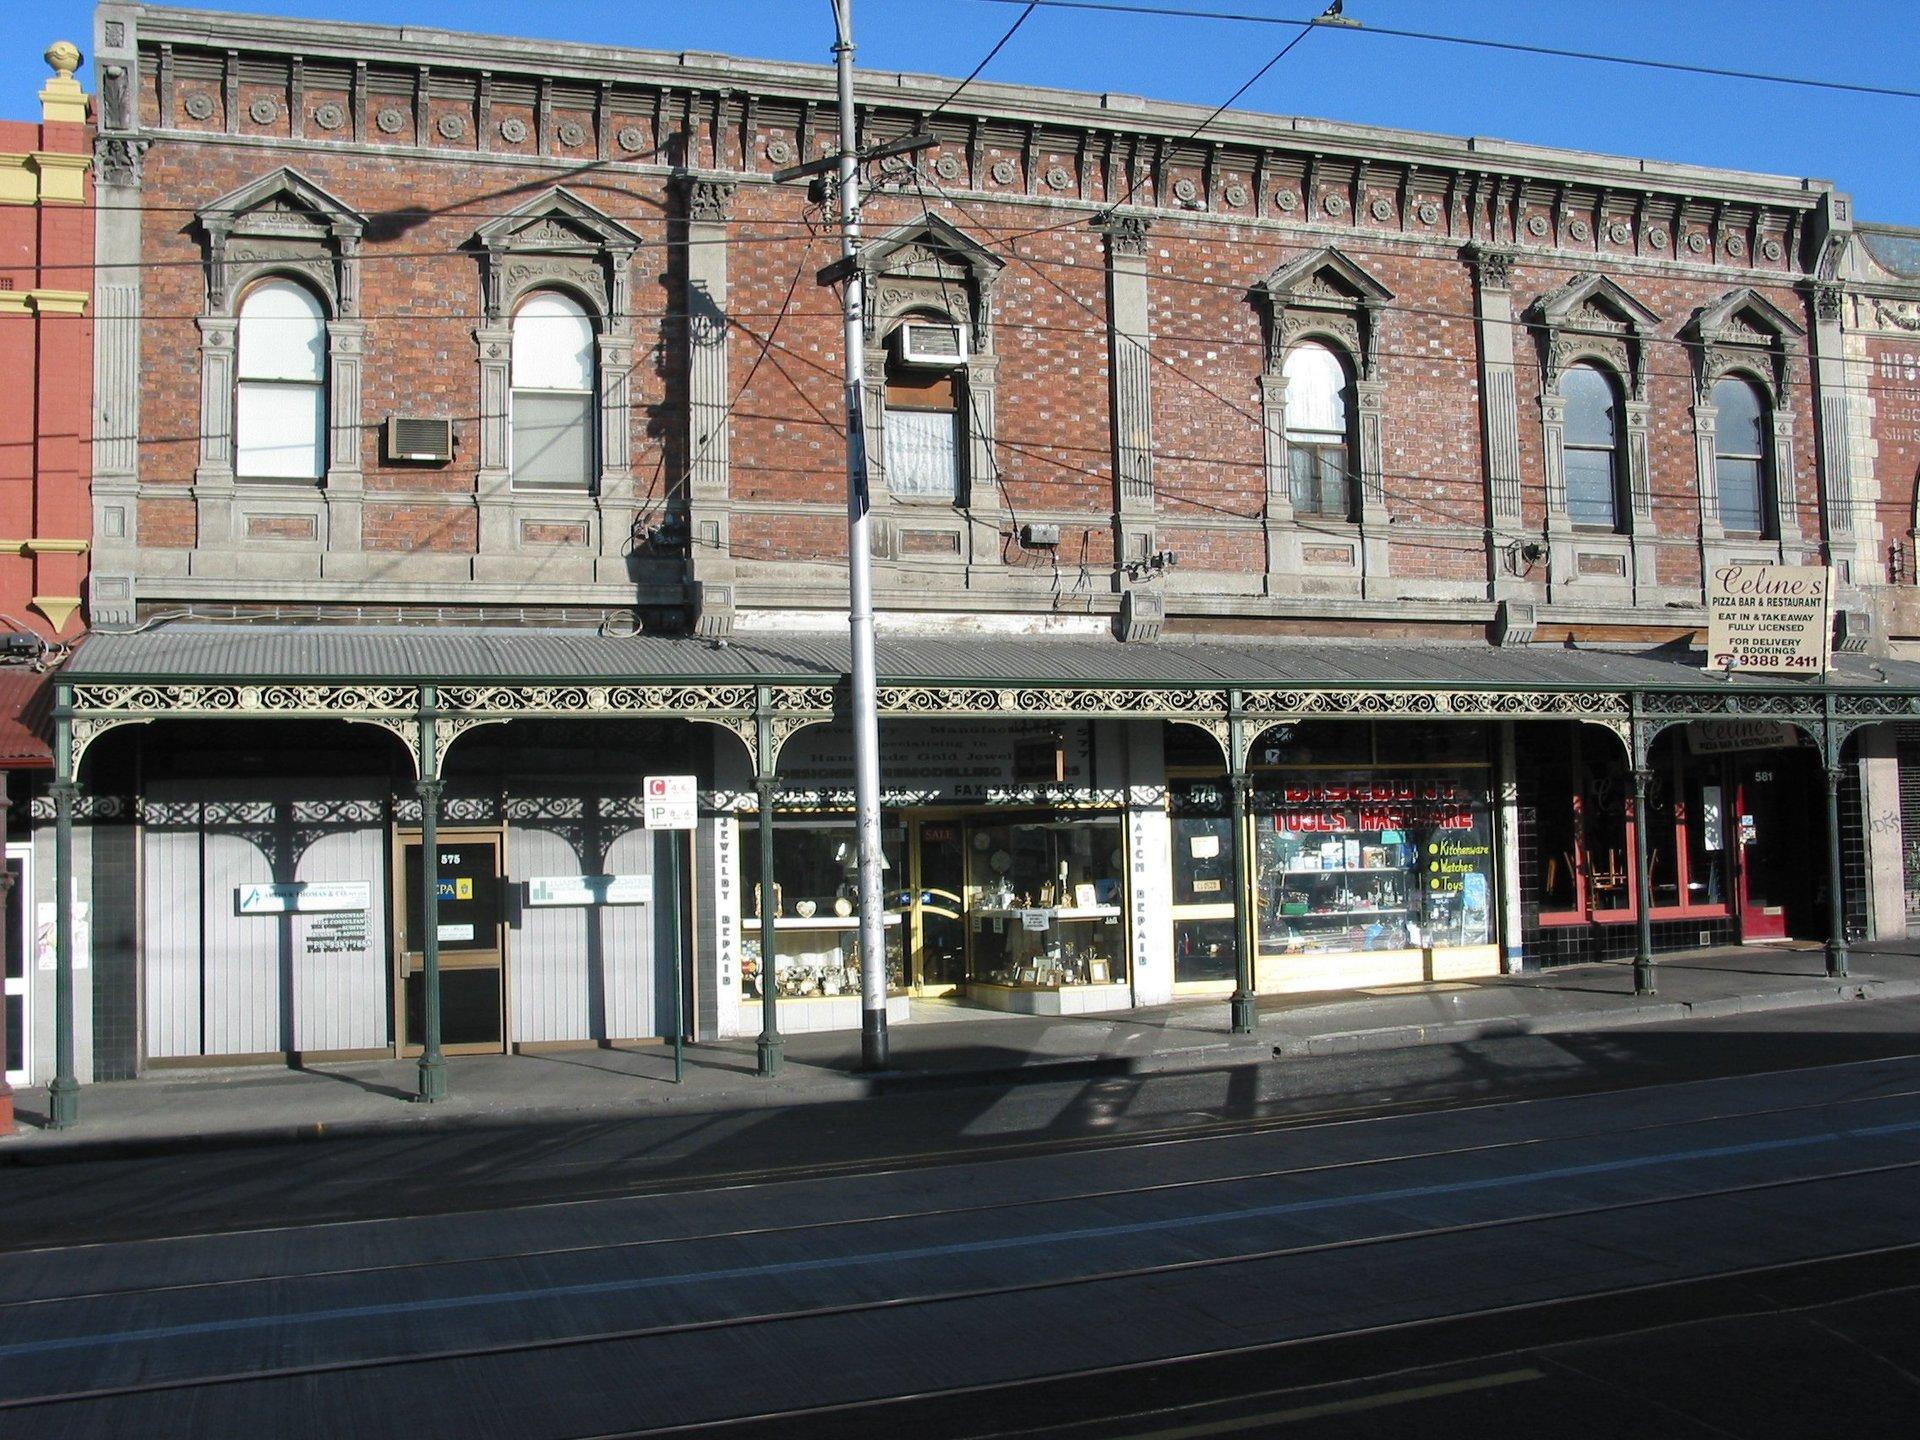 Continuous cast iron street verandah